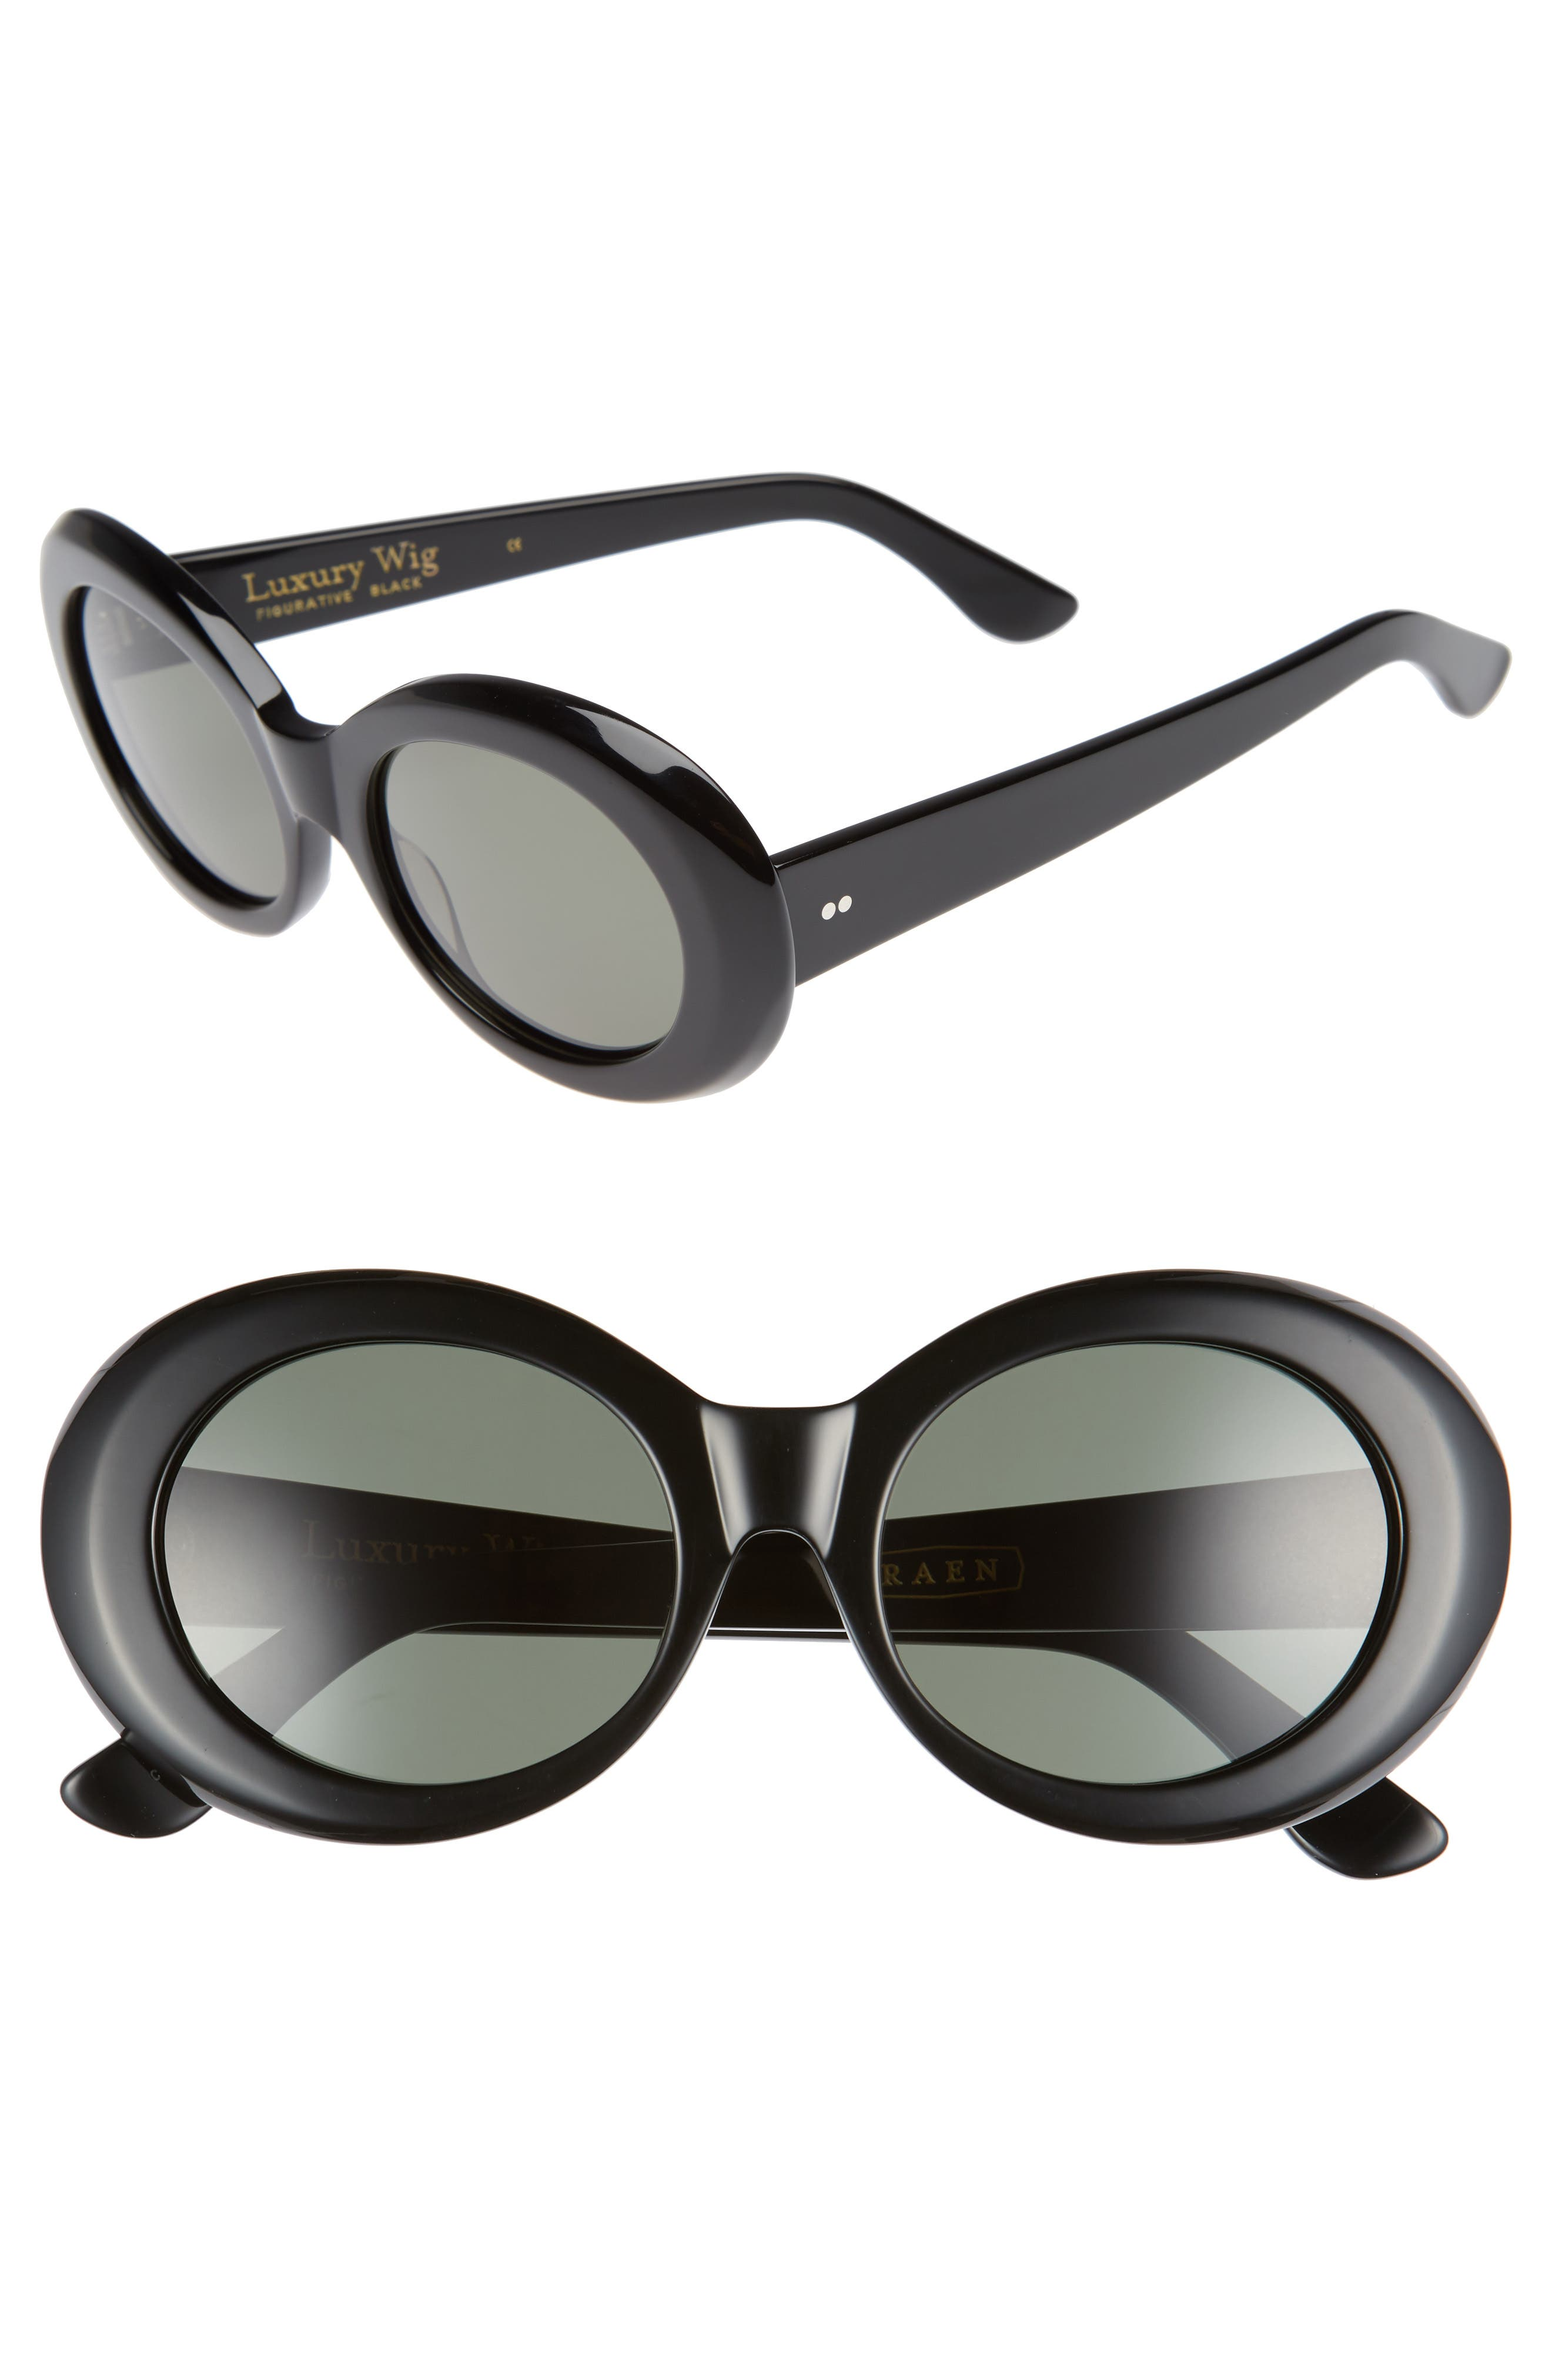 x Alex Knost Luxury Wig Figurative 53mm Sunglasses,                             Main thumbnail 1, color,                             001